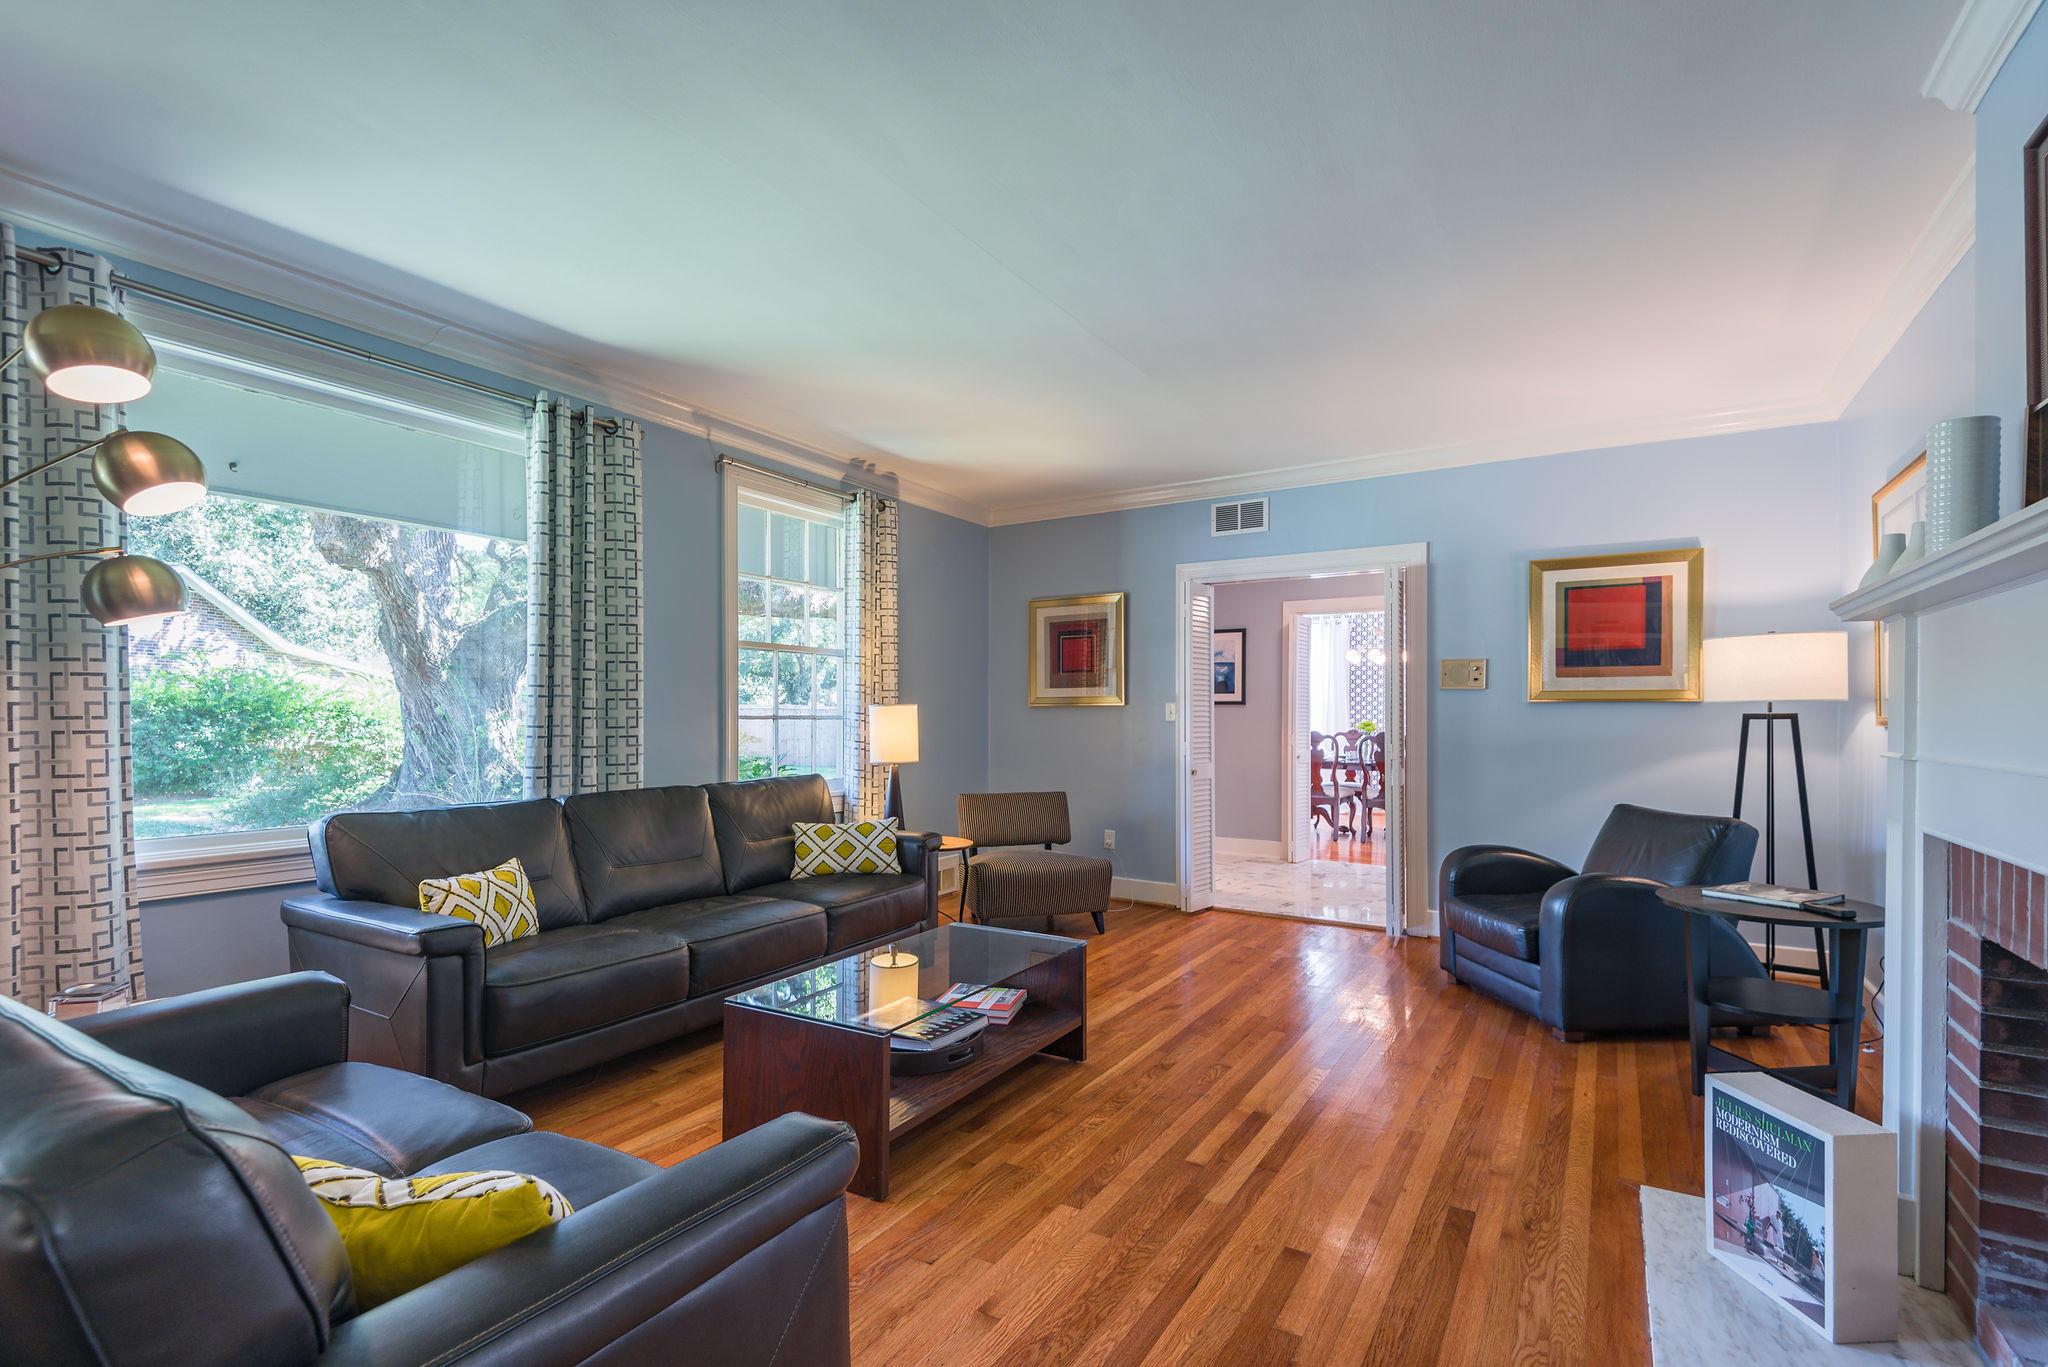 Sylvan Shores Homes For Sale - 450 Polony, Charleston, SC - 6